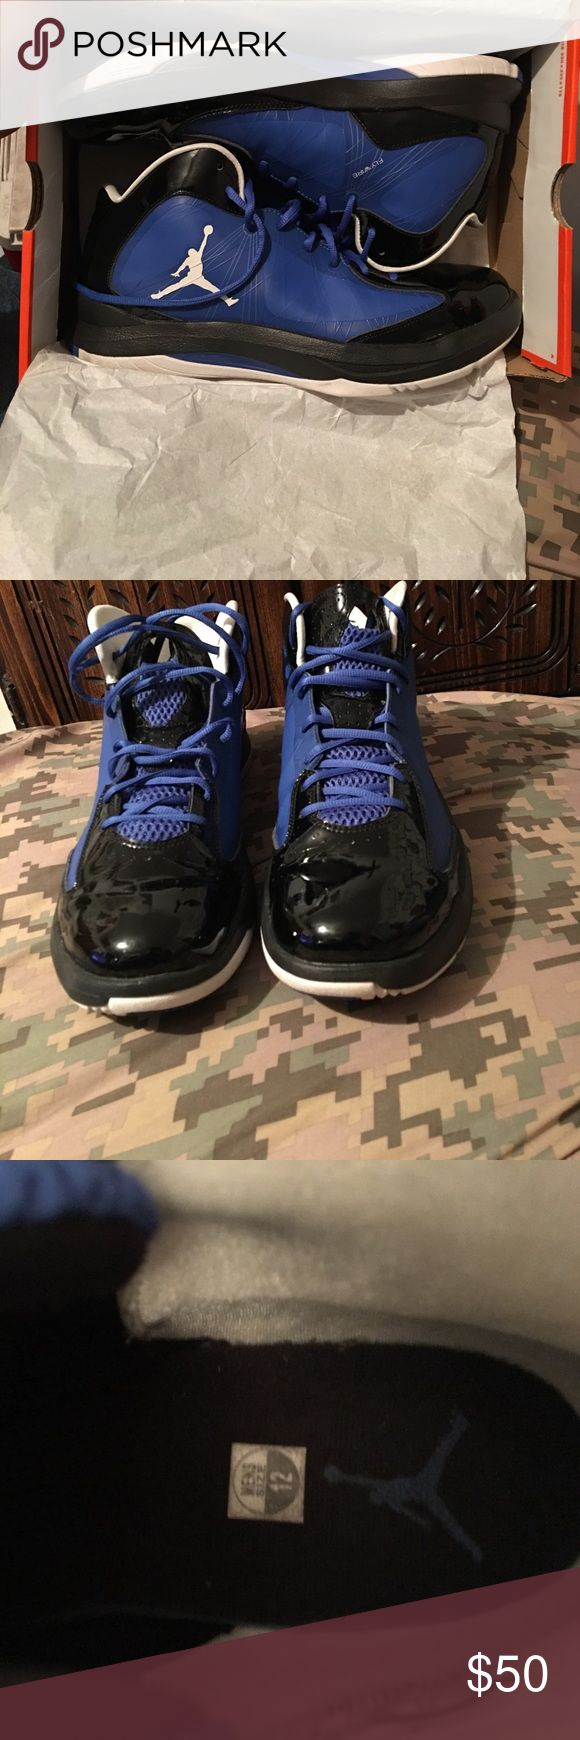 Air Jordan Aero Flight Nike Zoom Flywire Air Jordan Aero Flight Nike Zoom Flywire Mid Blue and Black Jordan Shoes Athletic Shoes